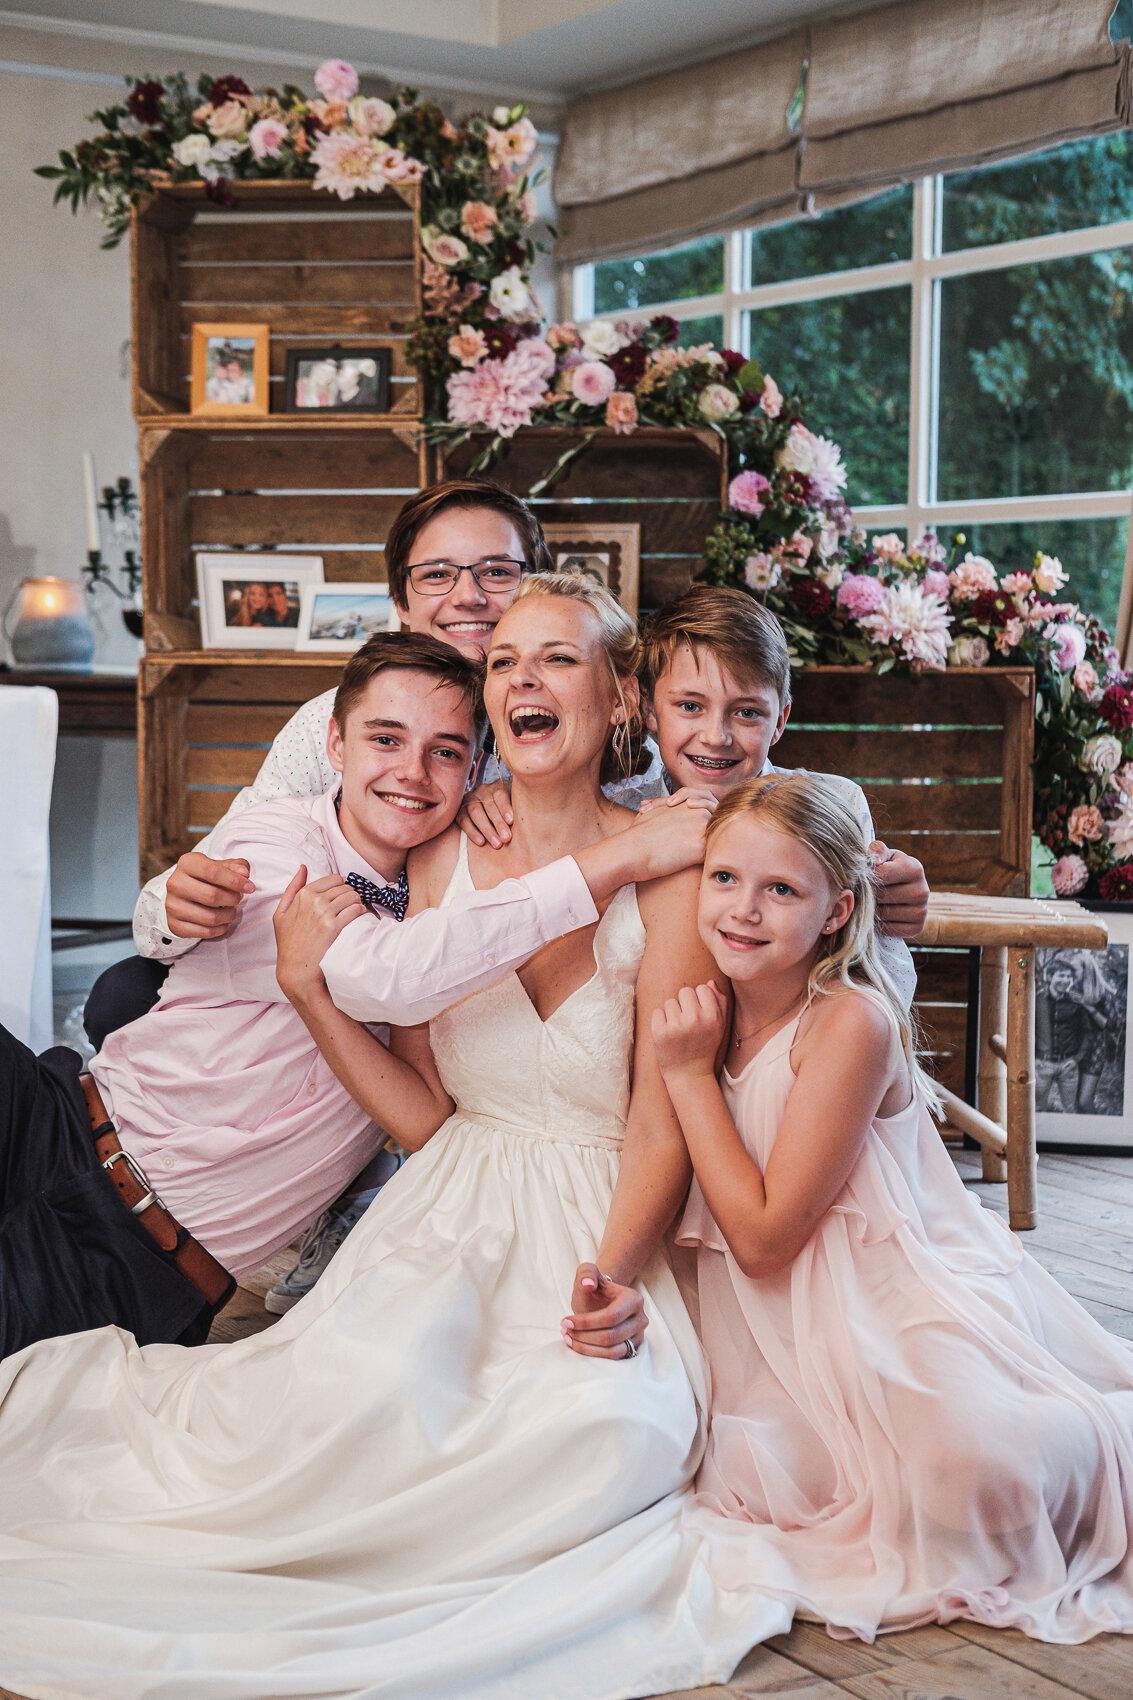 iso800 - huwelijksfotograaf isabo matthias verbeke foundation-28.jpg